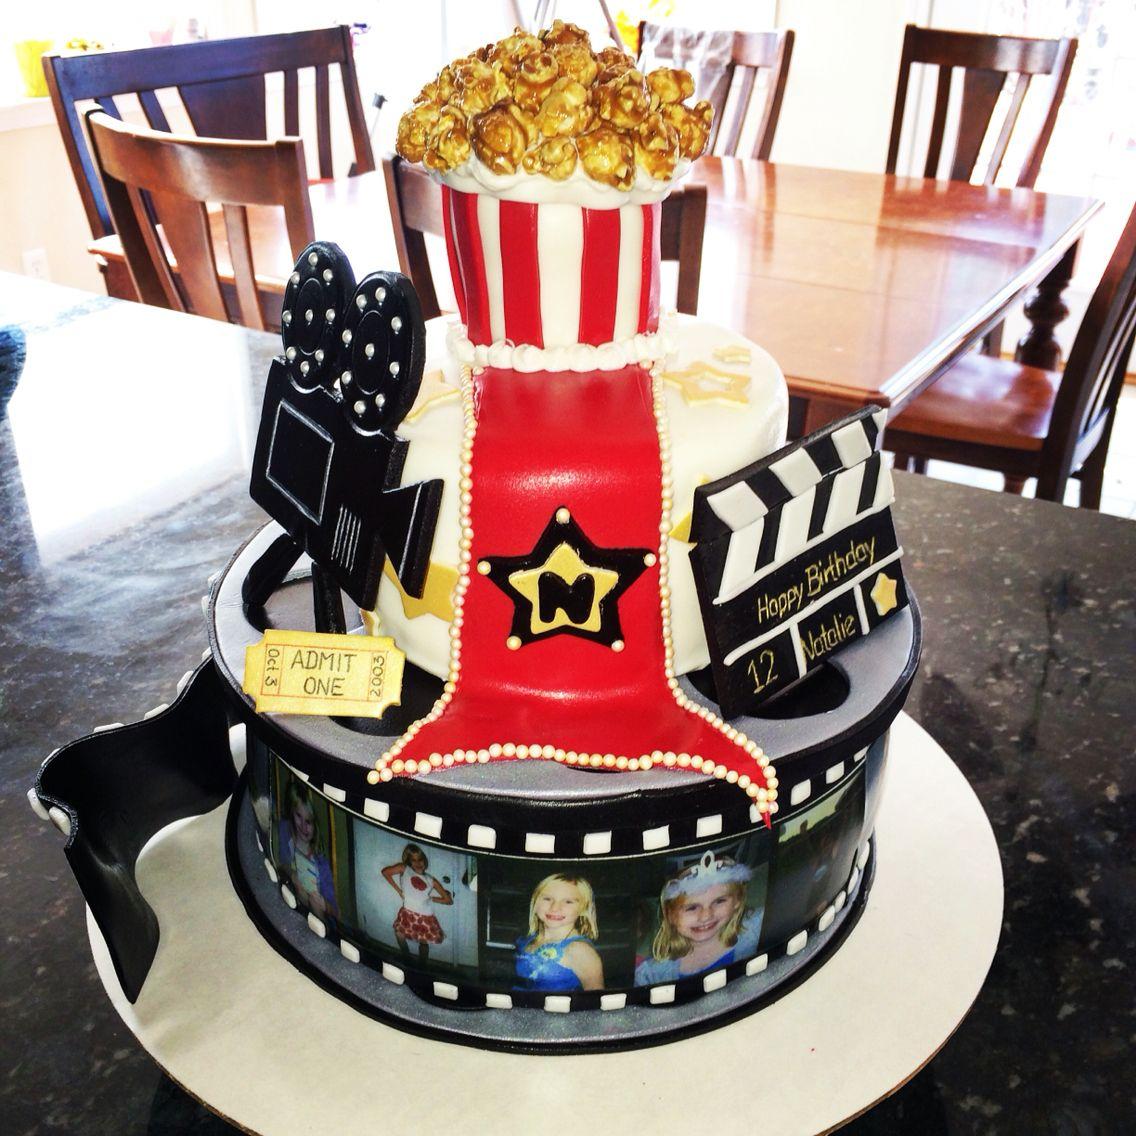 Birthday movies movie theatre red carpet popcorn film